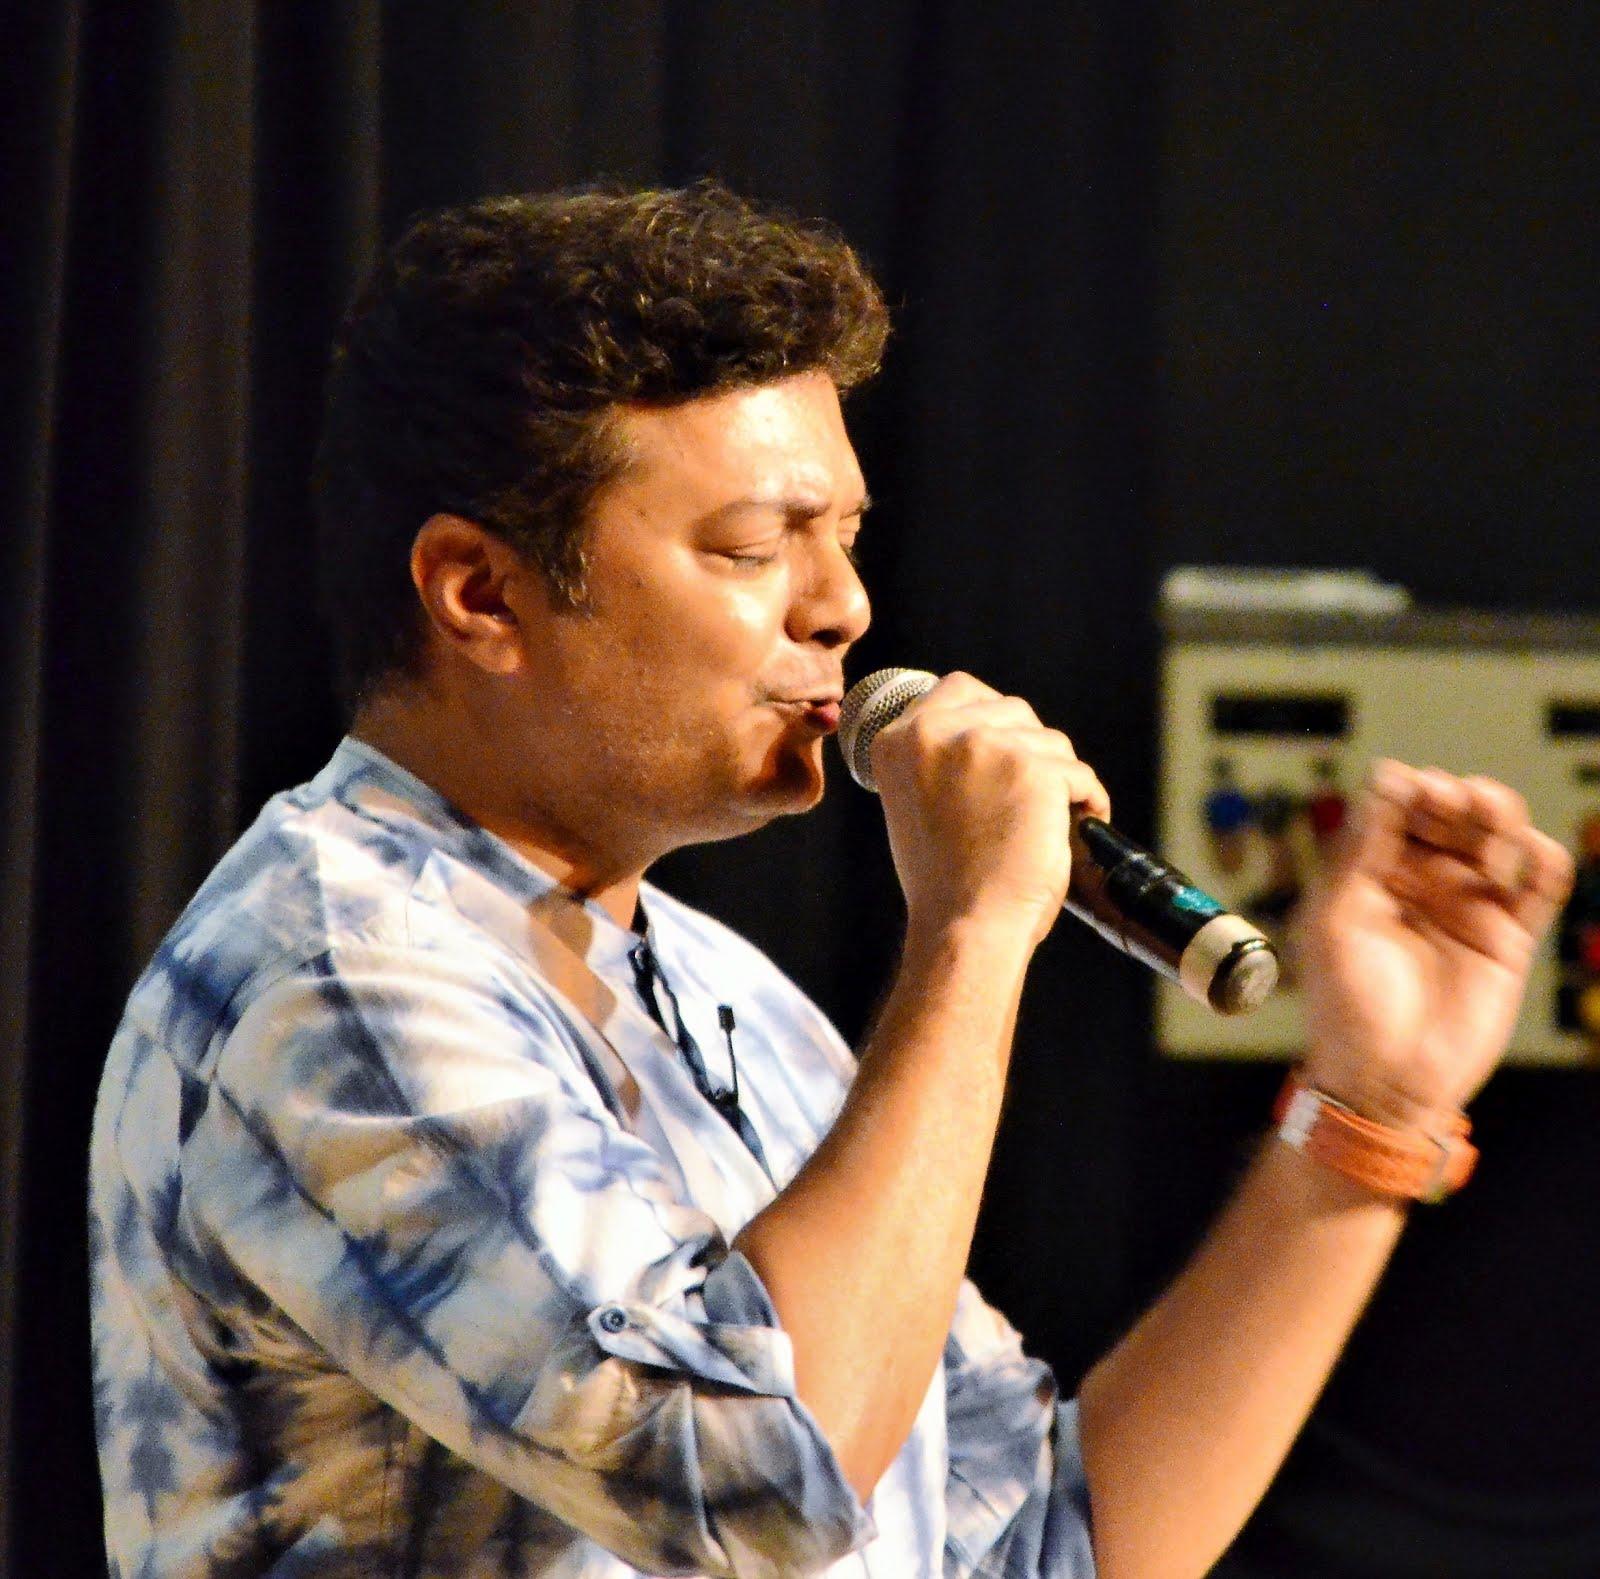 मुलाखत - गायक आणि संगीतकार अजित परब